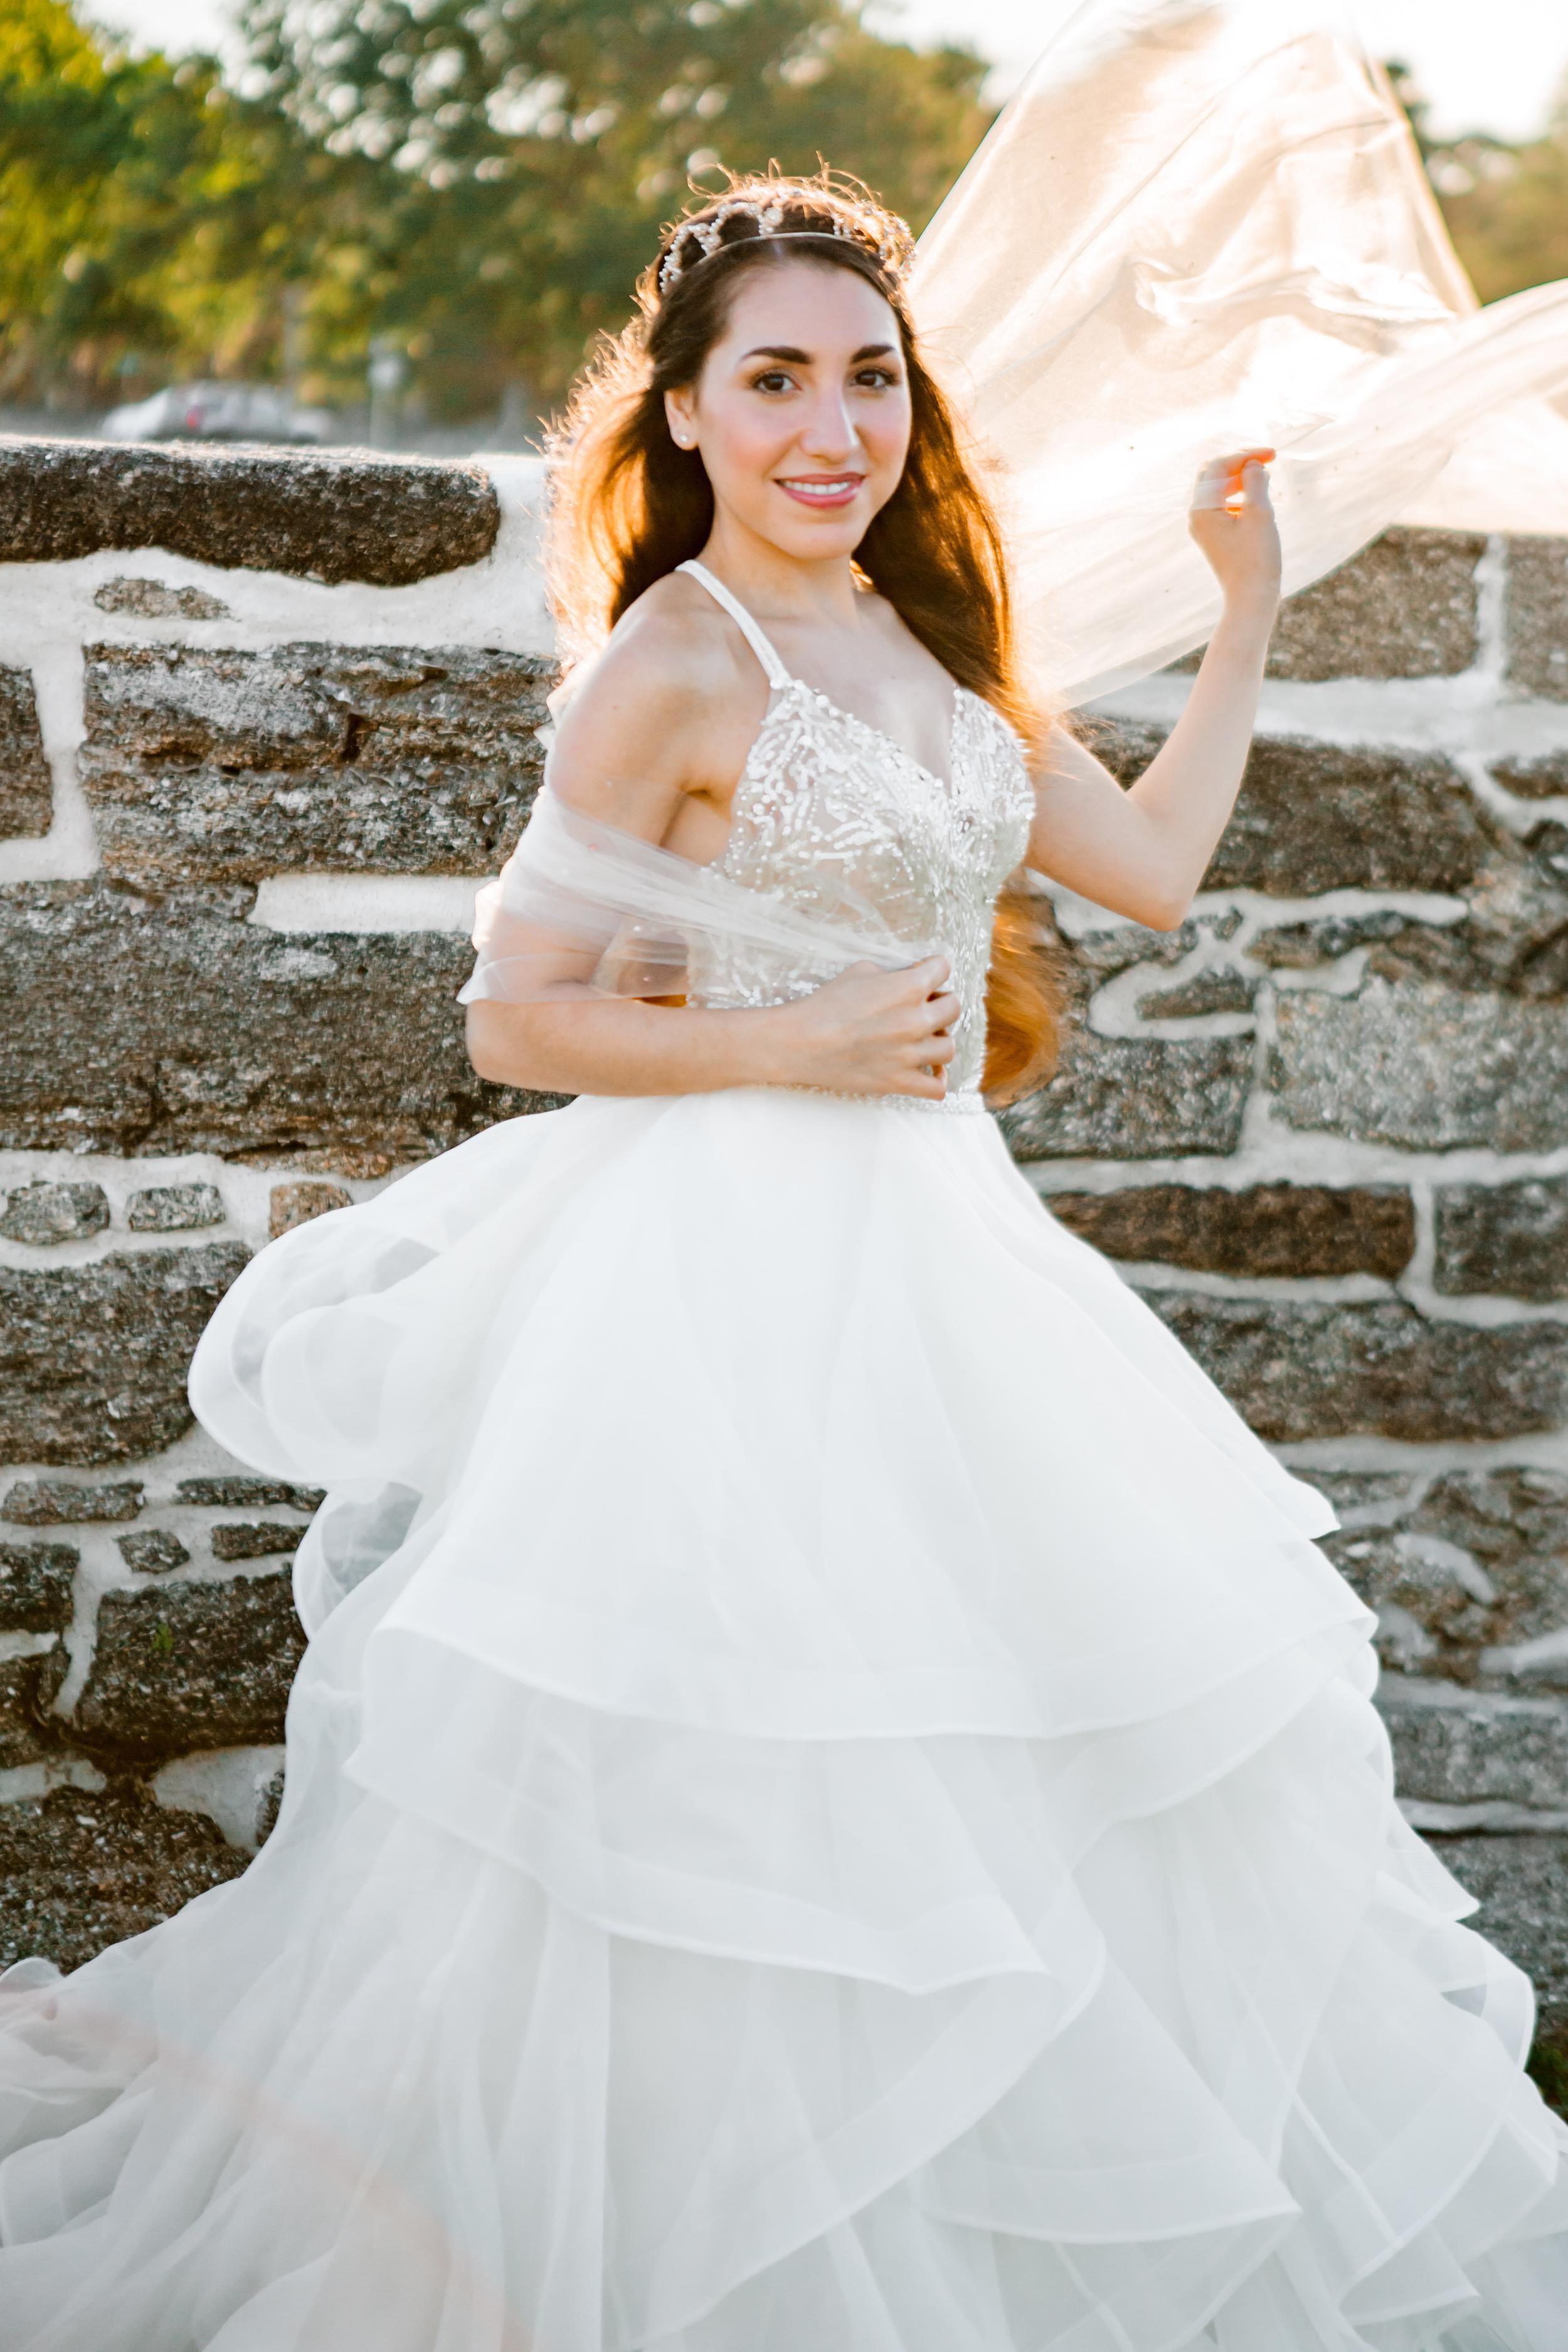 St. Augustine fine art wedding castillo de san marco floral wedding photographer shaina deciryan 46.jpg